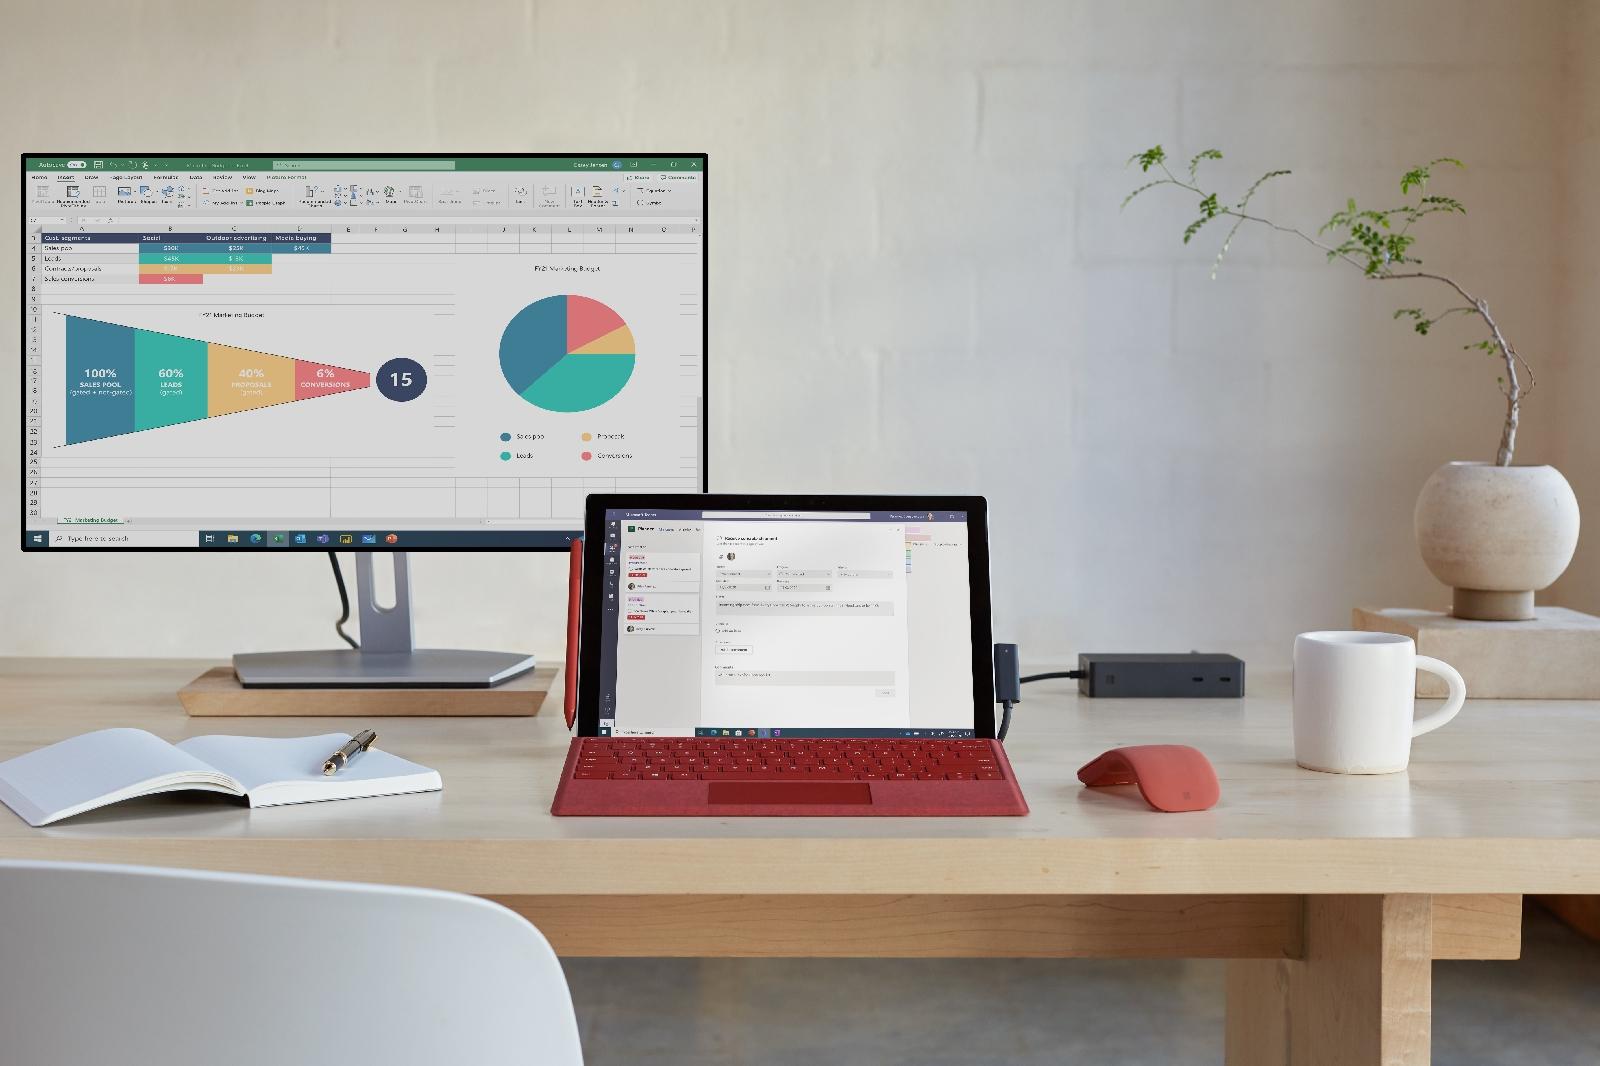 Surface Pro 7+ for Business สร้างมาเพื่อทีม เพื่อการเรียนรู้ เพื่อคุณในอีกระดับแห่งยุคดิจิทัลใหม่ เริ่มจำหน่ายอย่างเป็นทางการในประเทศไทย วันที่ 8 กุมภาพันธ์ 2564 นี้